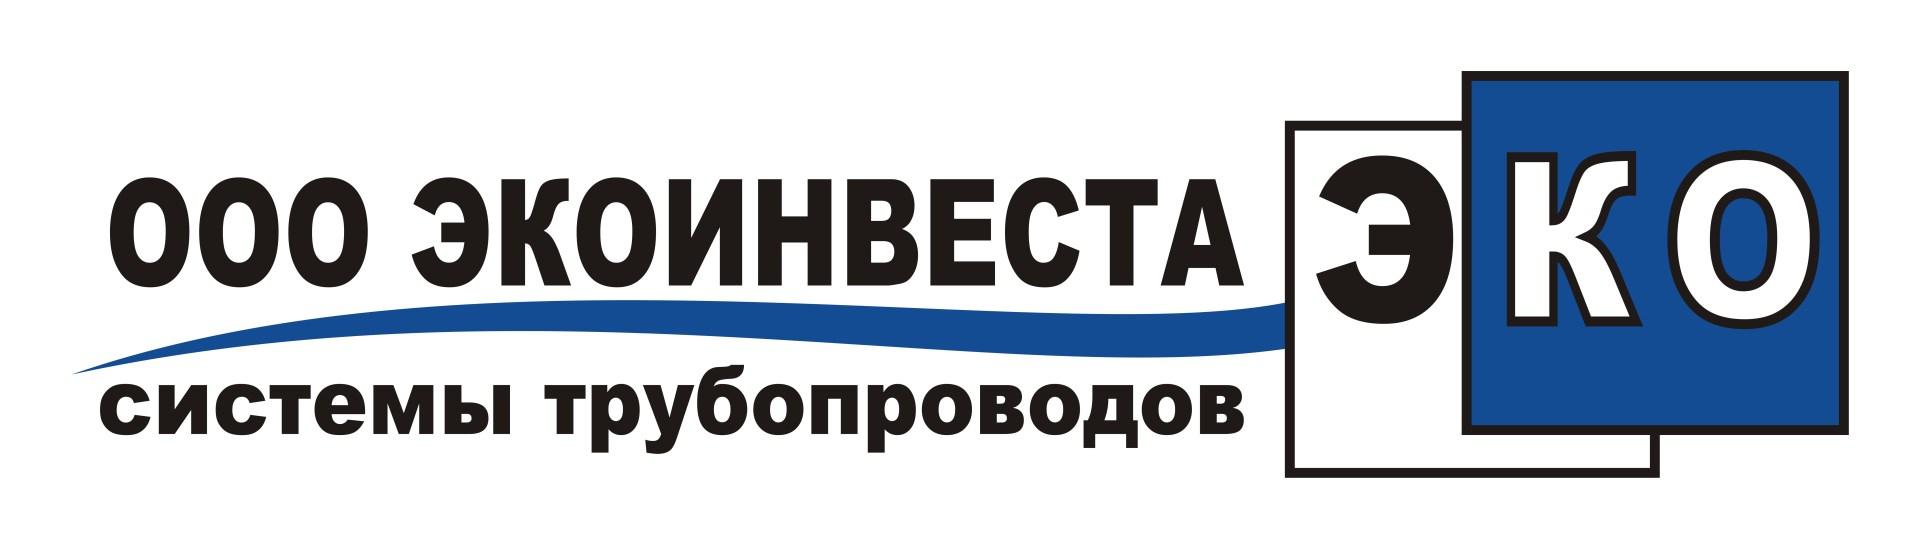 logo ЭКОИНВЕСТА (ООО)